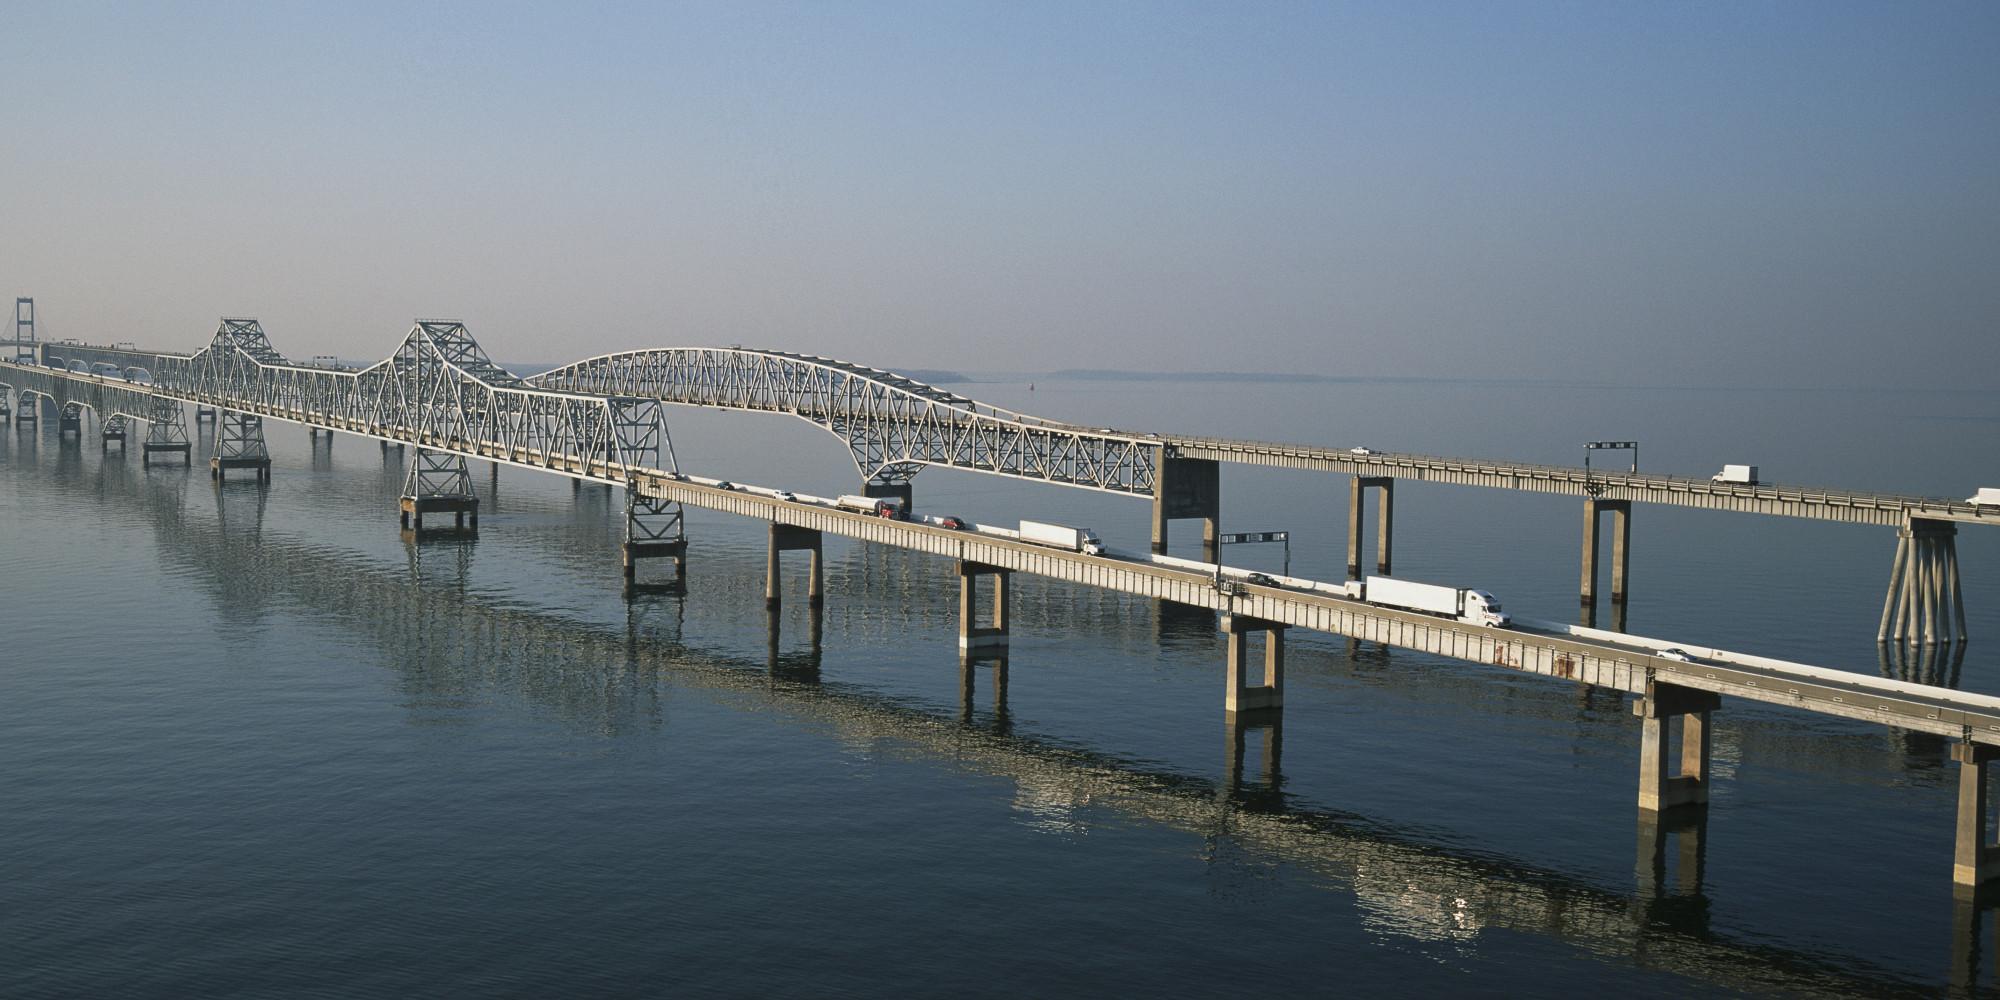 Haunted Airbnb Truck Driver In Chesapeake Bay Bridge Crash That Sent Car